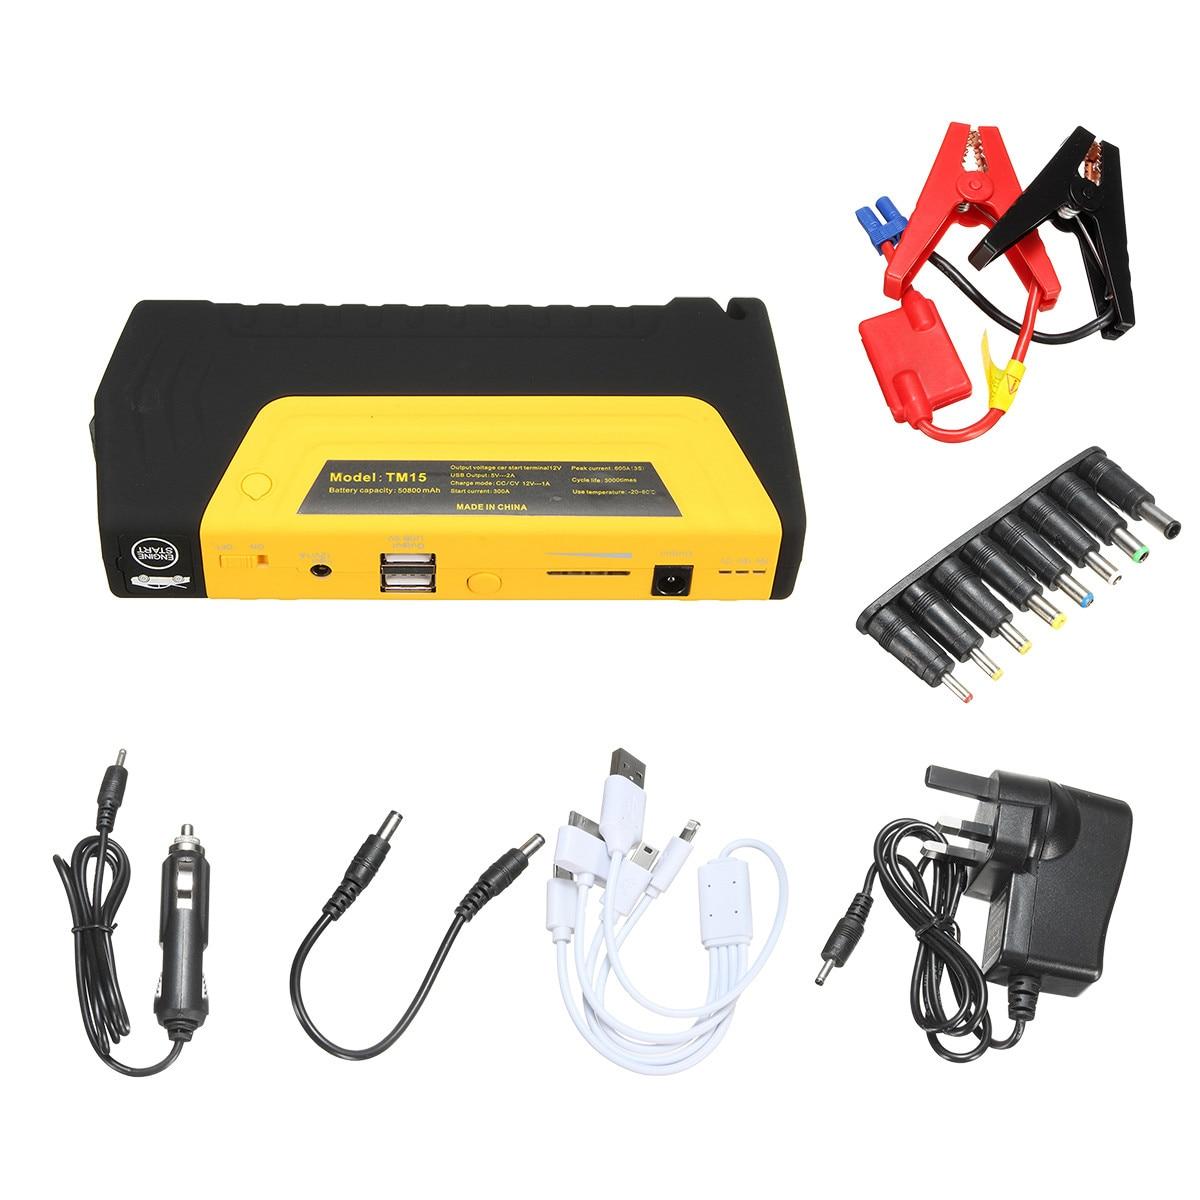 50800mAh LED Dual USB Car Jump Starter Booster Portable Power Bank Backup Charger Power Supply